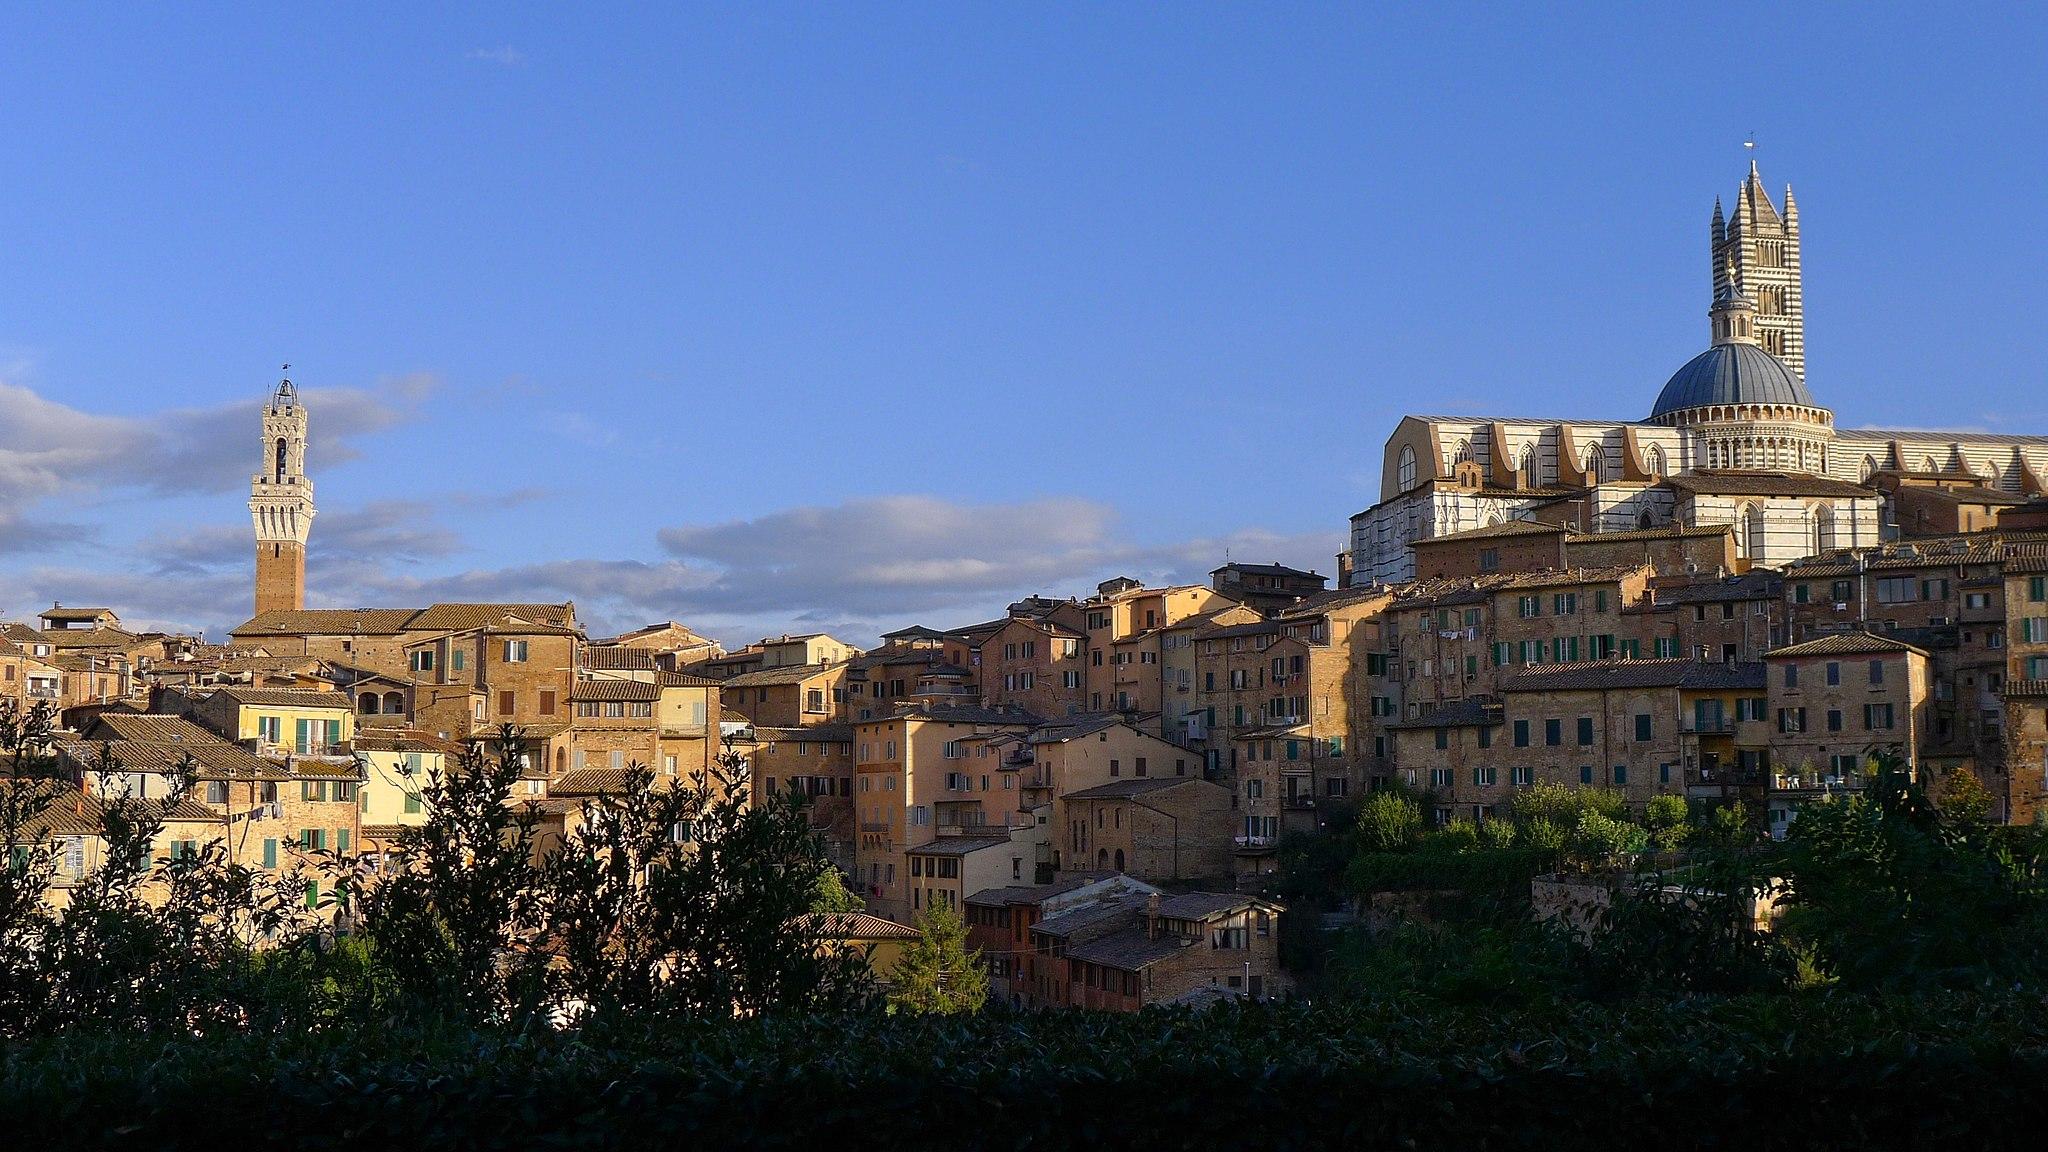 Siena Palazzo-Pubblico-Duomo-JBU01